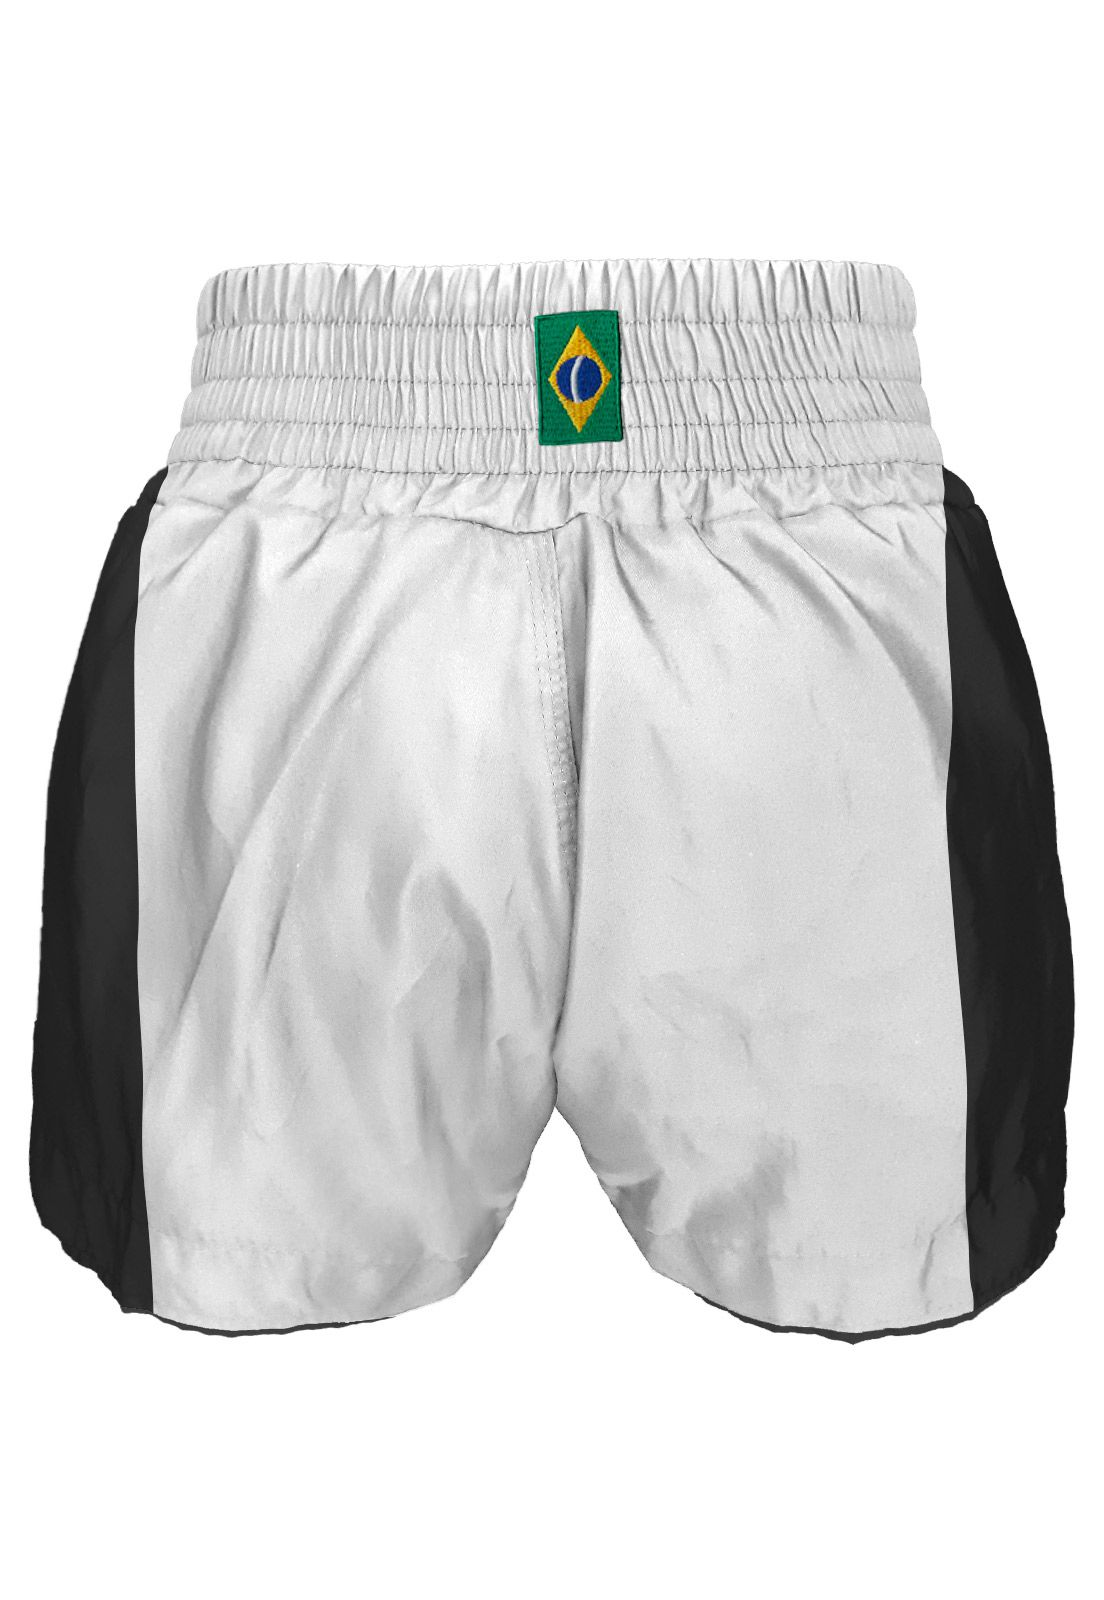 Short Uppercut Muay Thai Thailand